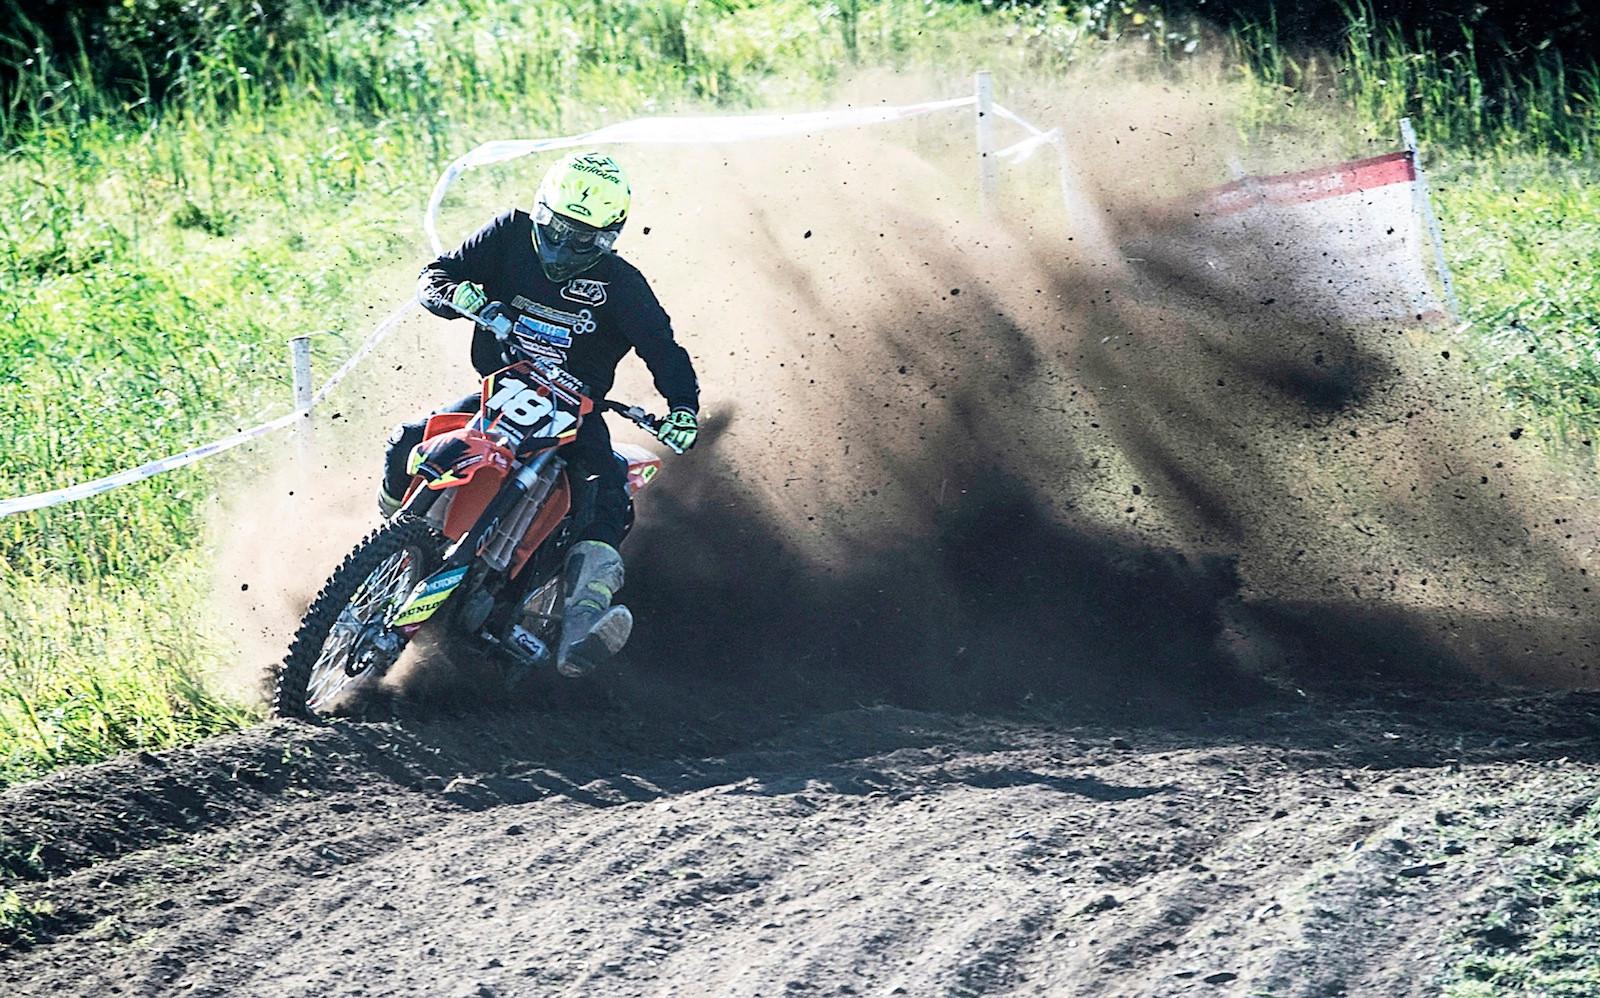 COLOUR - Motocross Dirt Biker by Ian Pearson (8 marks)